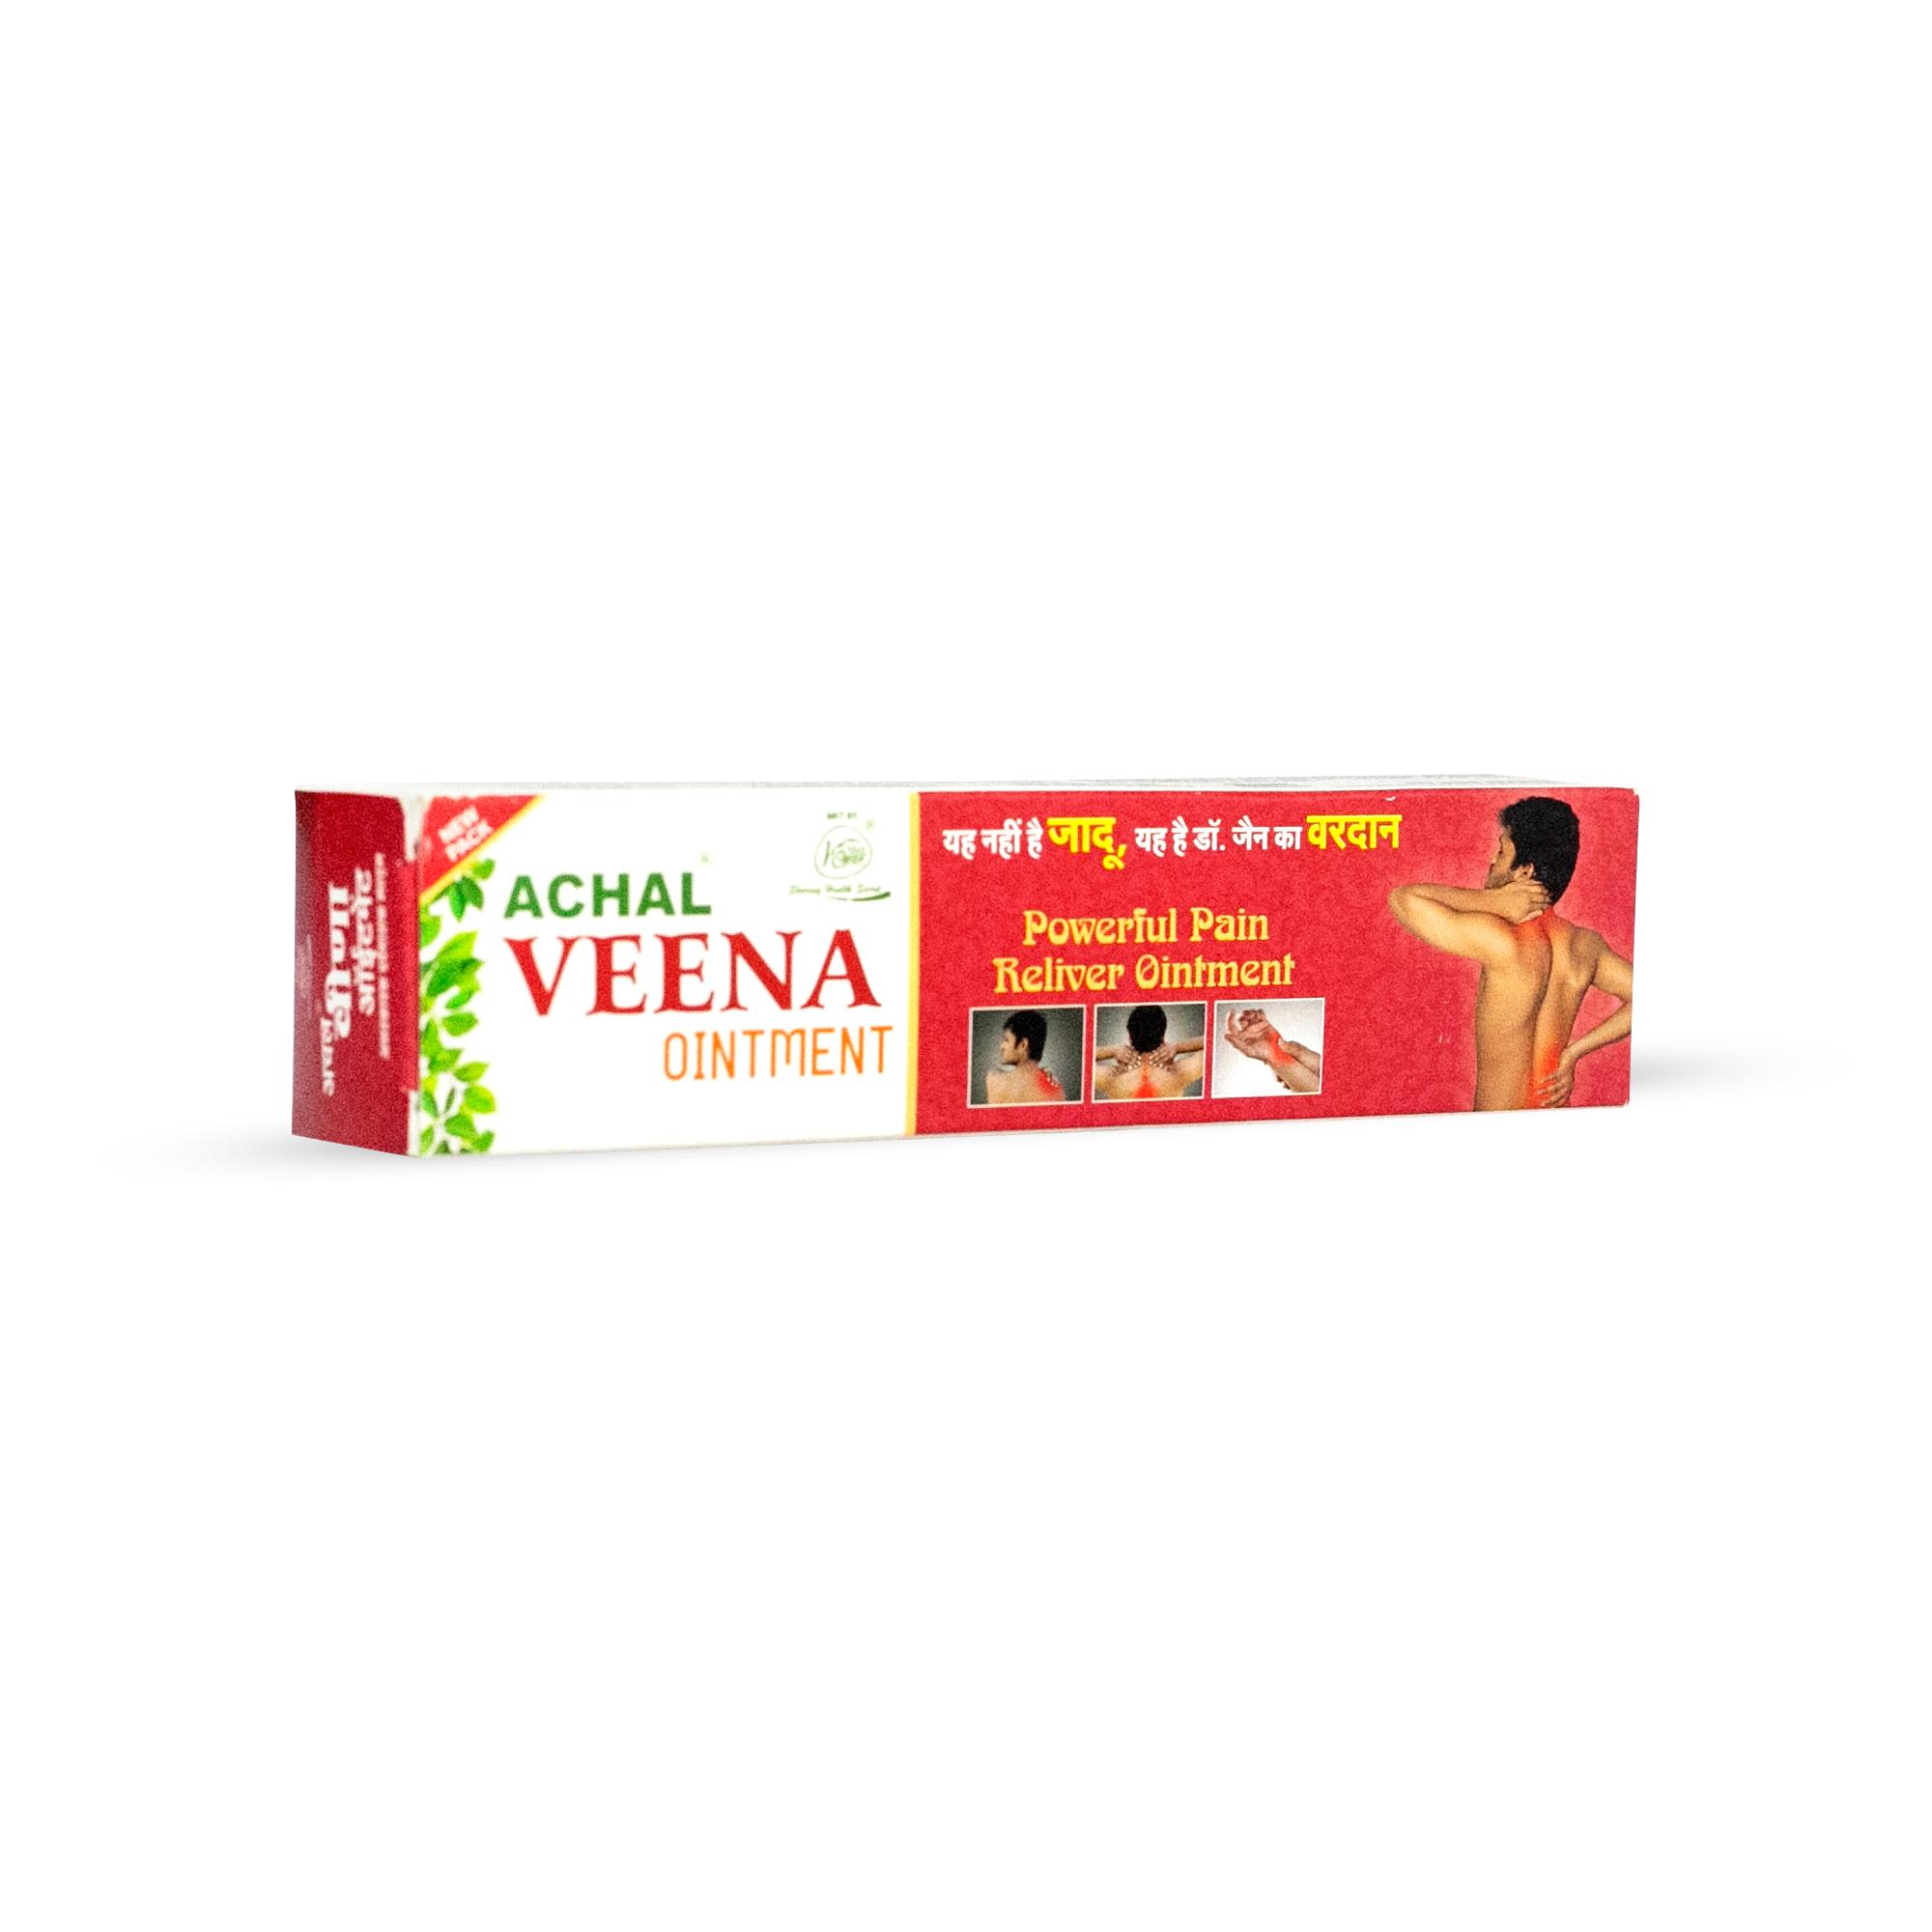 Achal Veena Ointment